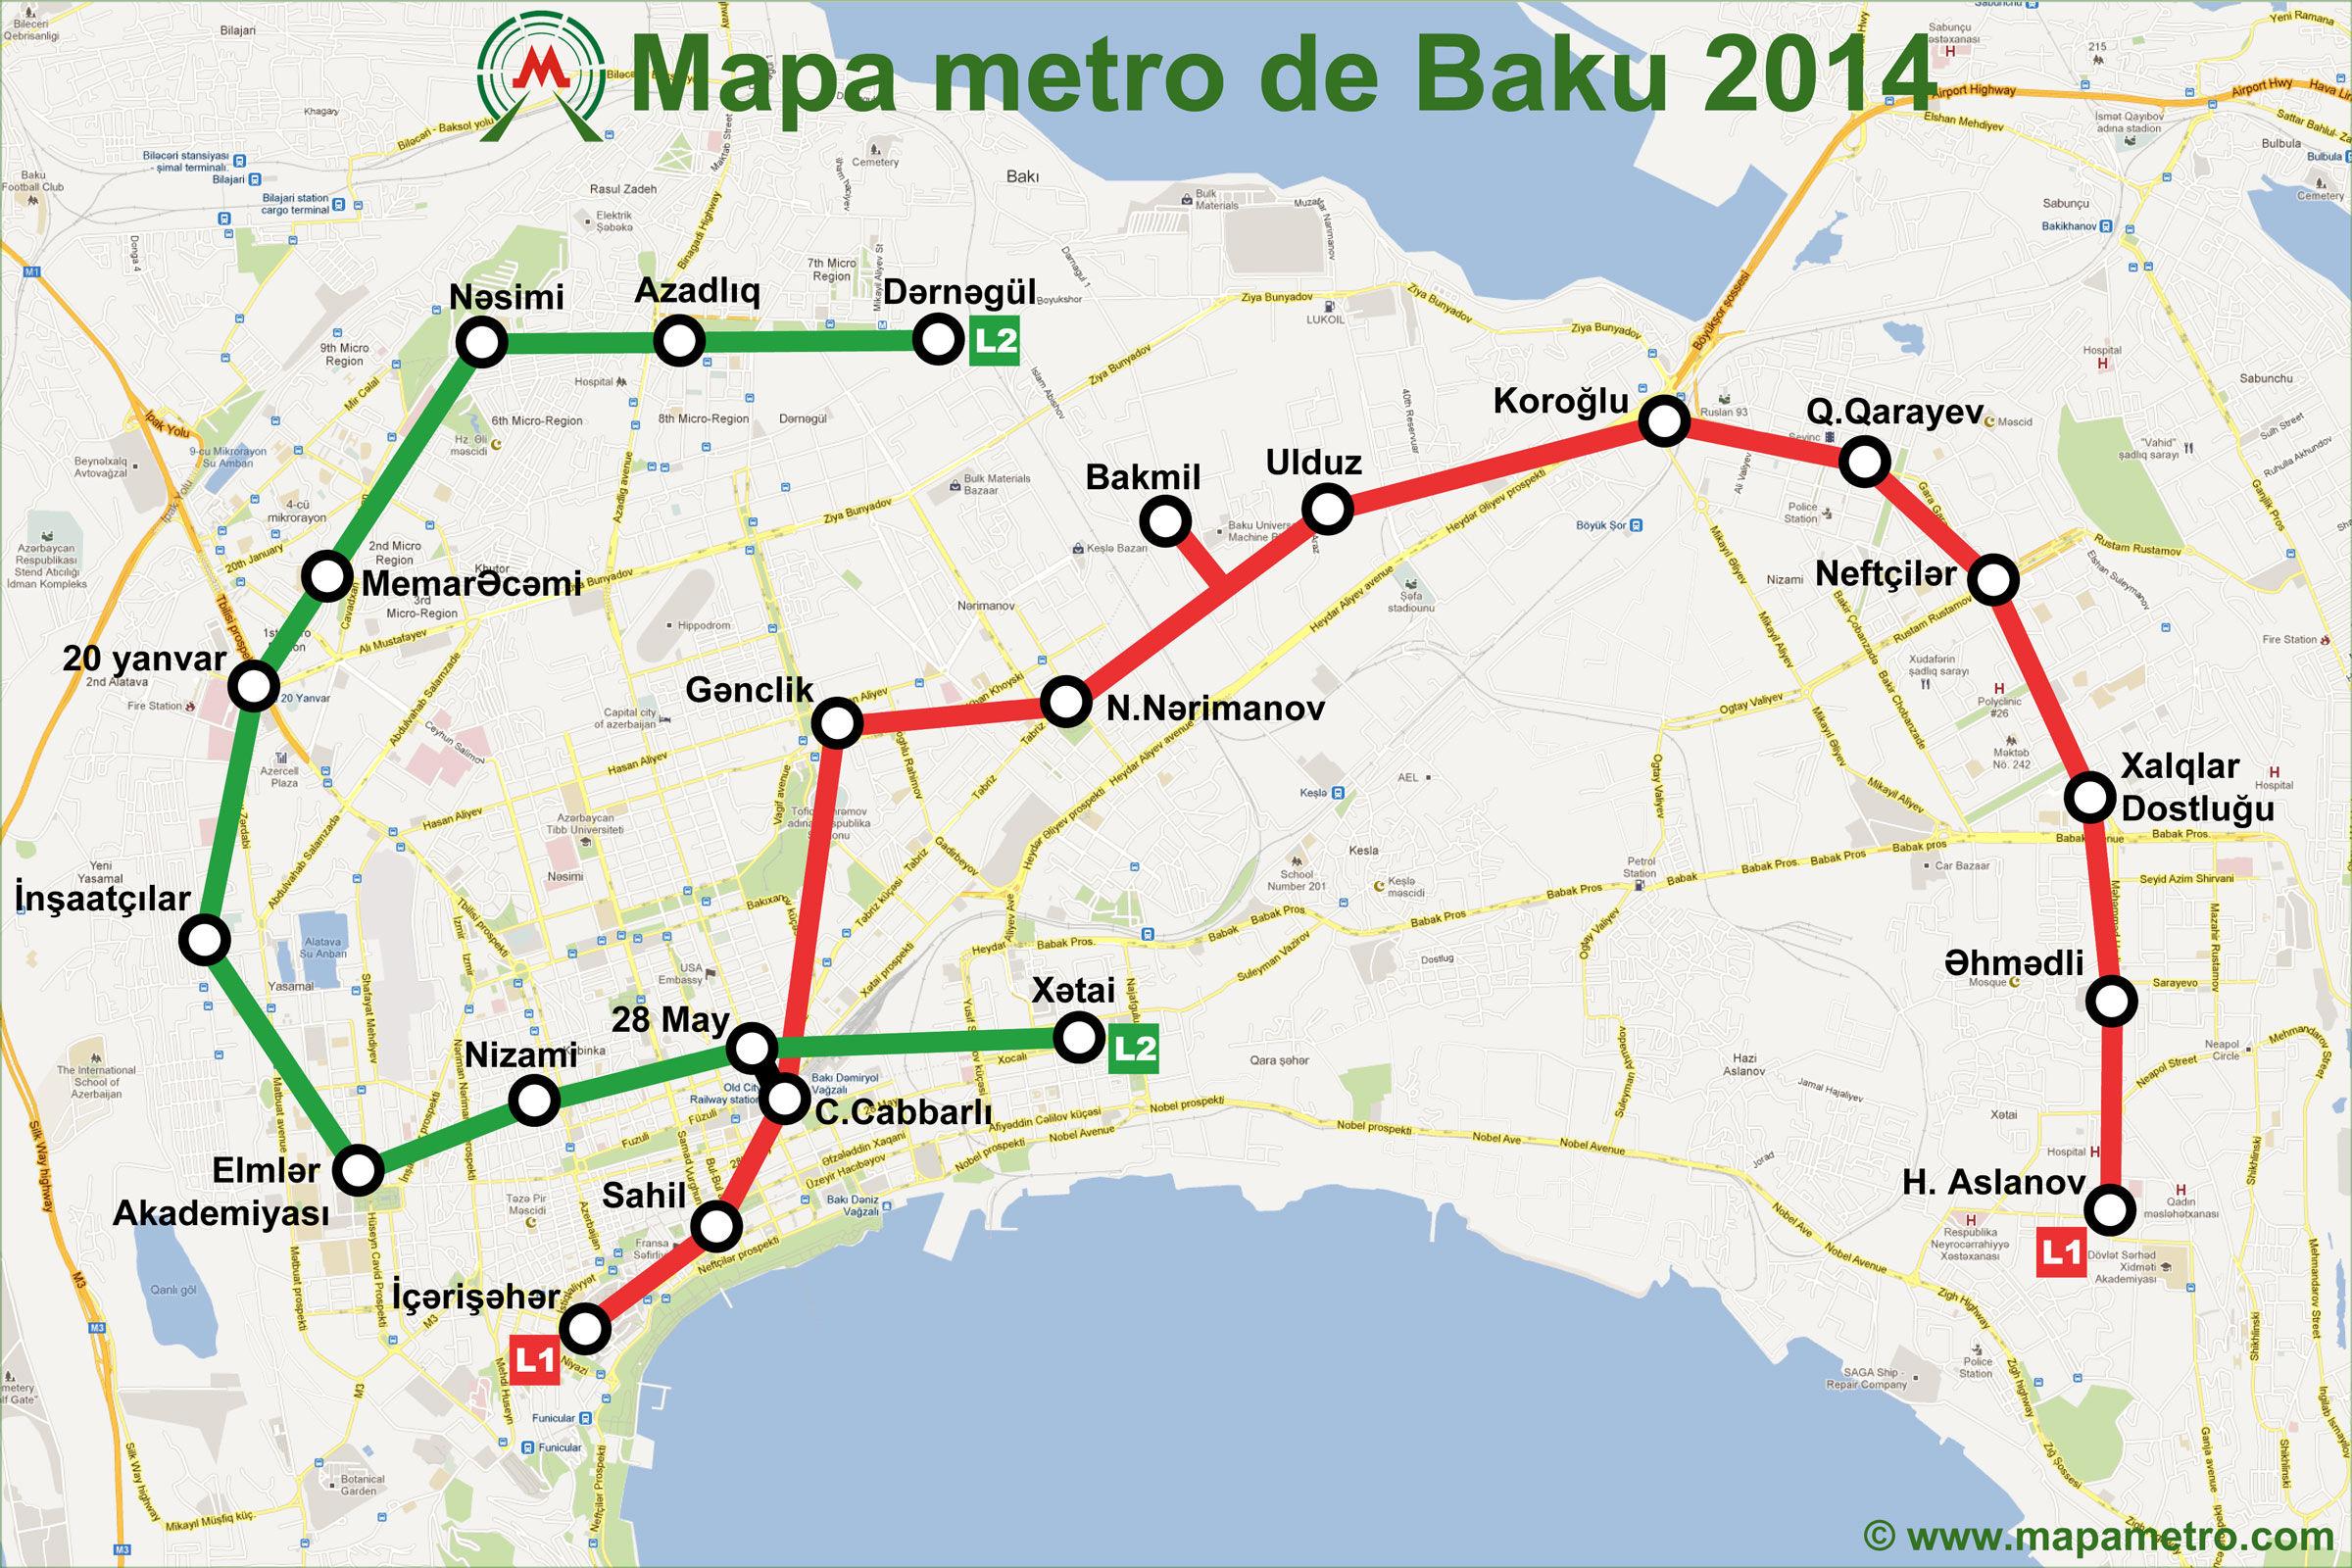 Azerbaijan Mapa Metro - Where is baku